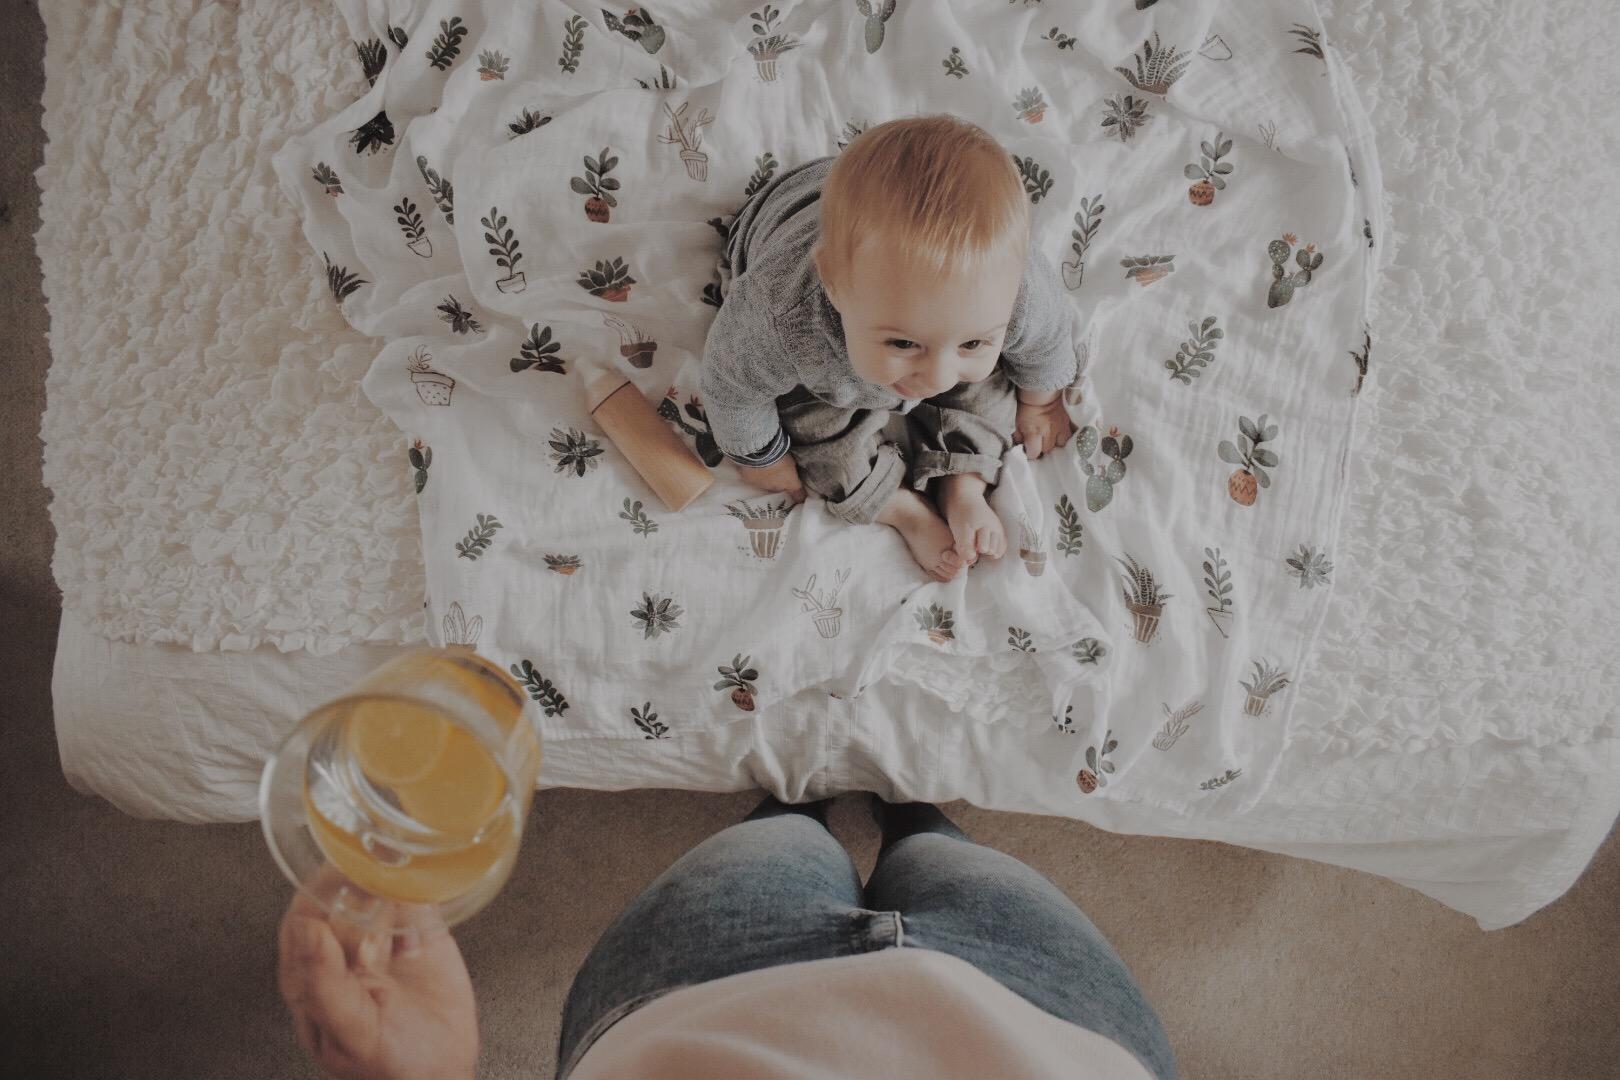 fresh lemon tea and a happy baby @hannah.fanciful